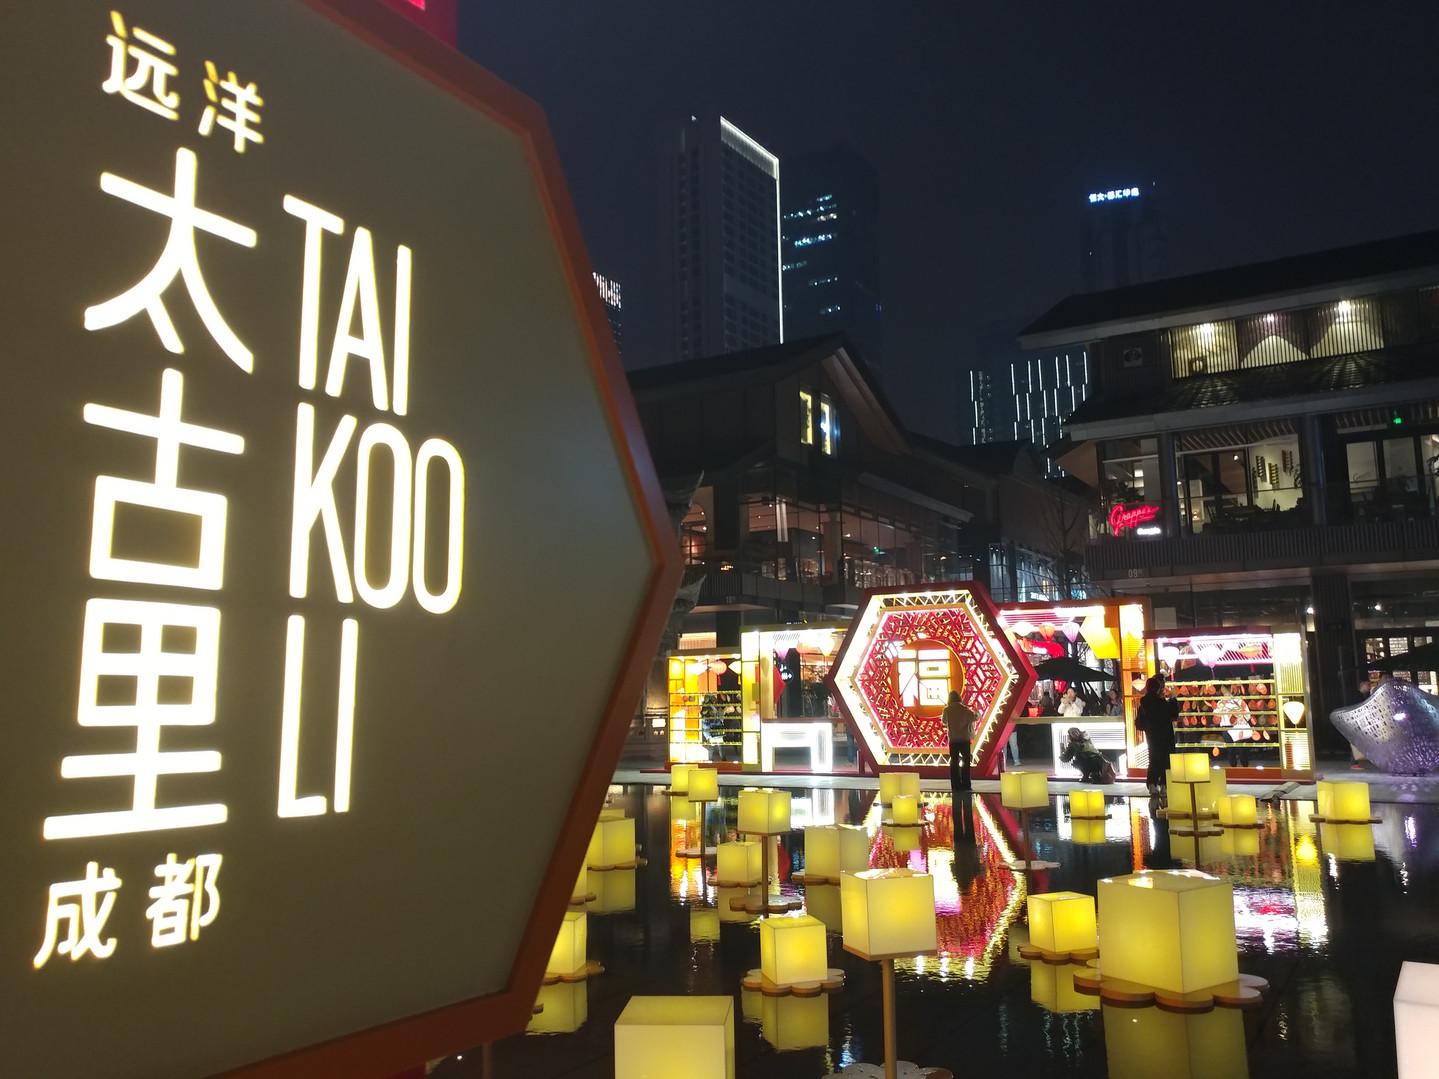 Chengdu Taikoo Li CNY Project 成都太古里春节项目 2018